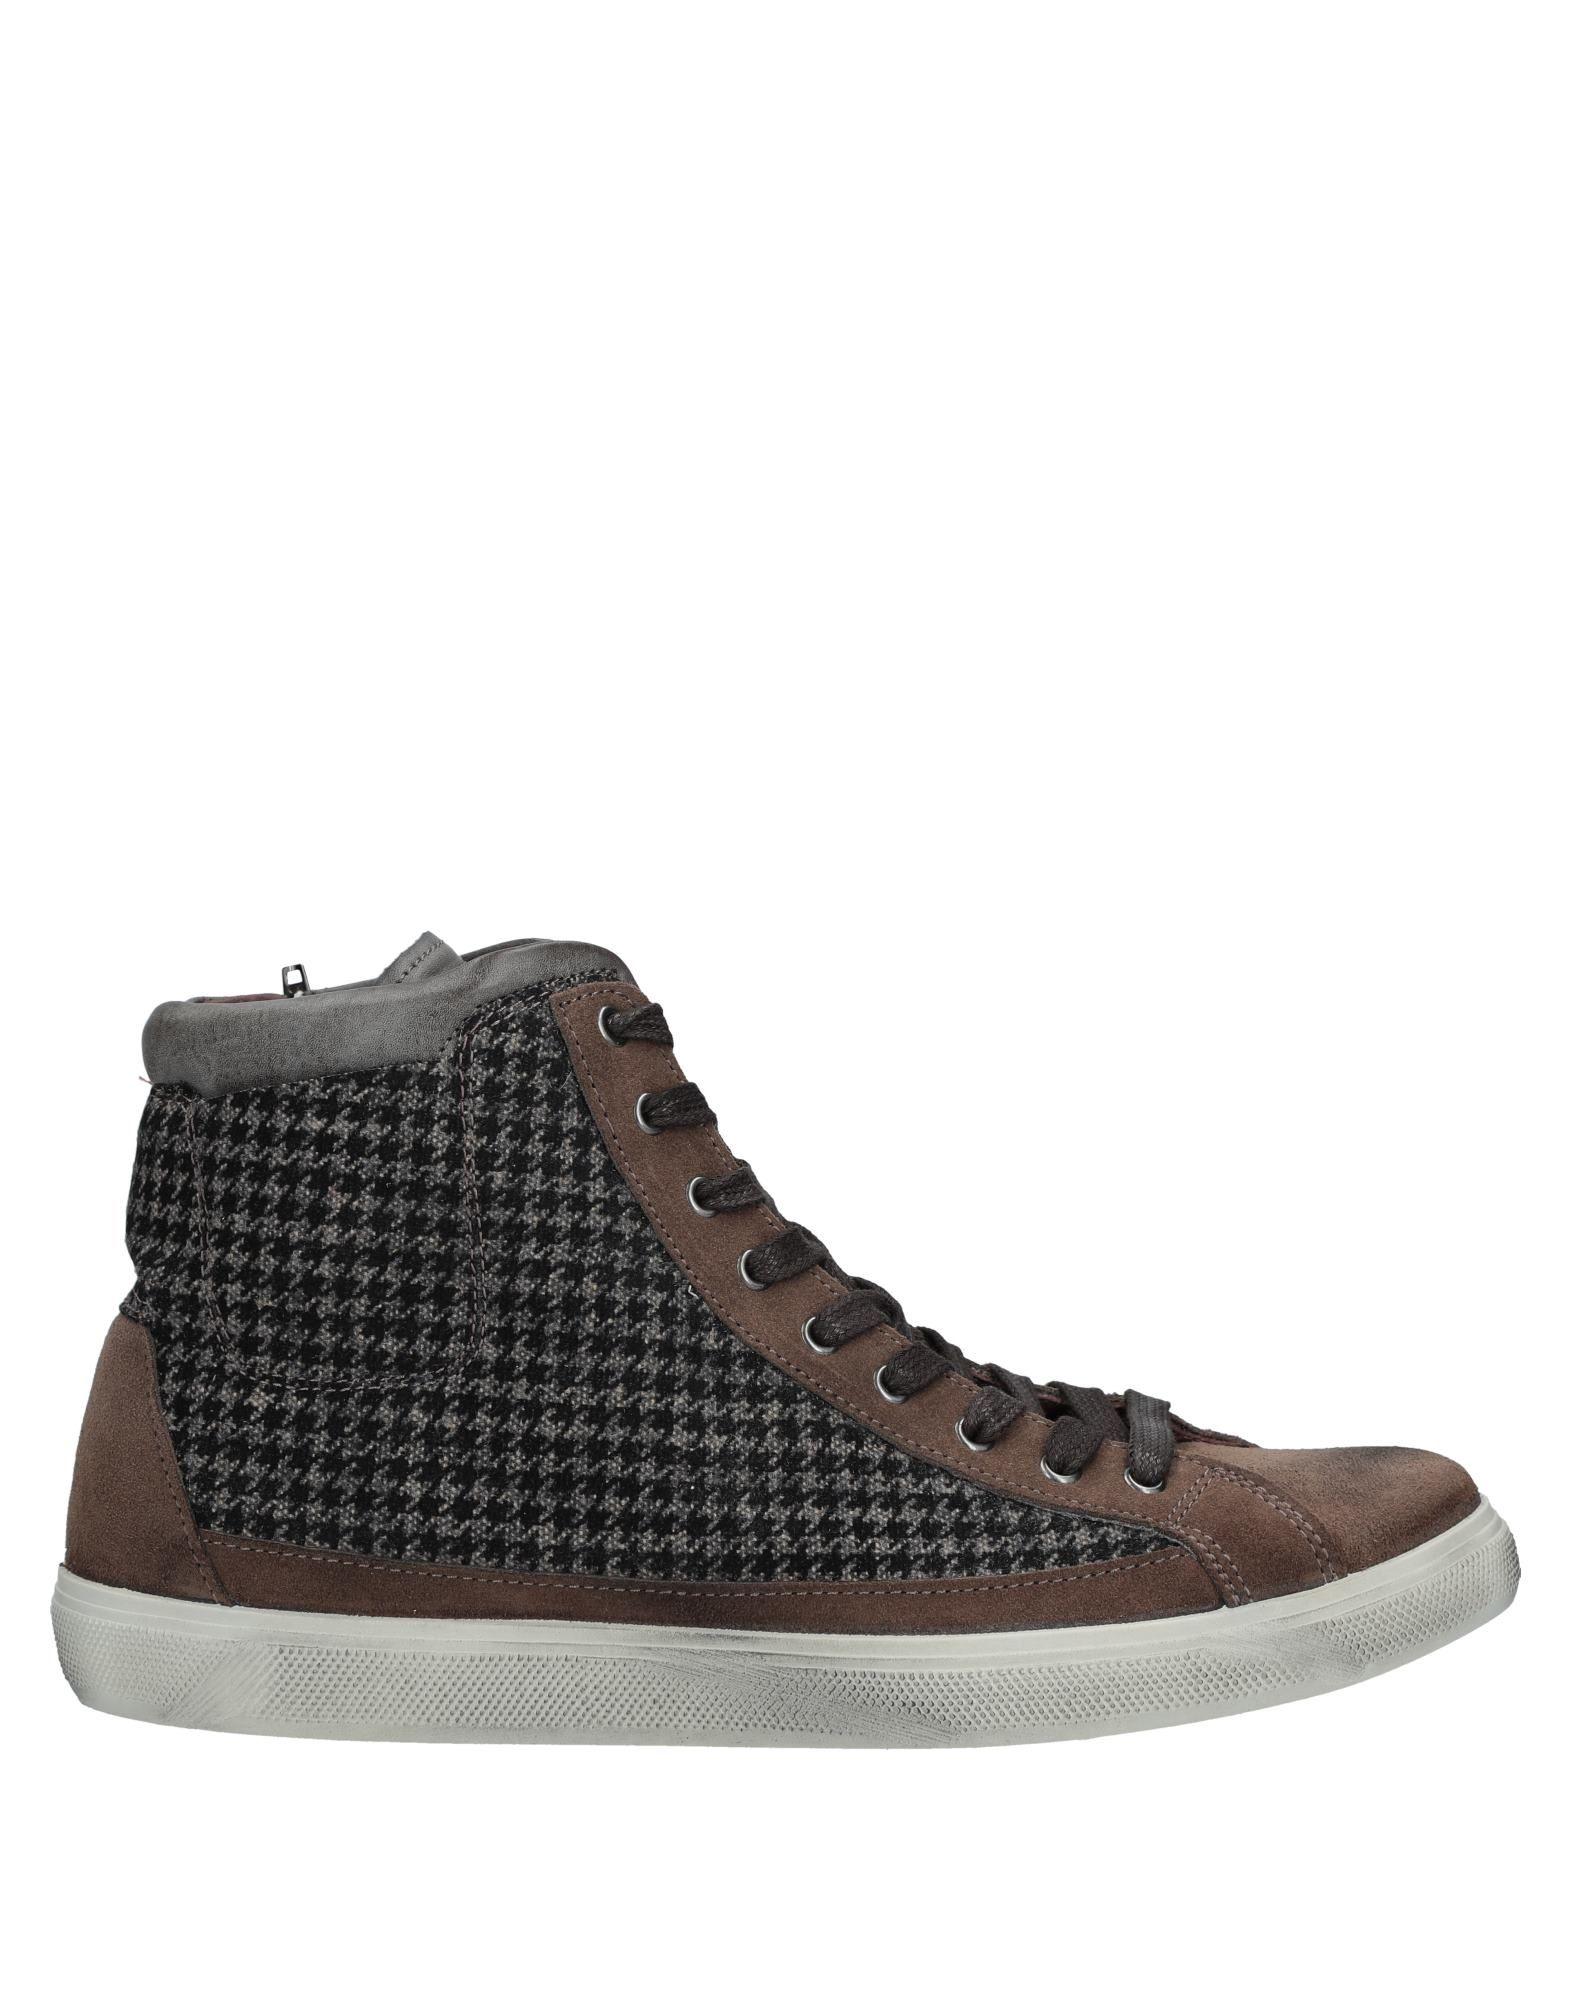 Rabatt echte Schuhe Beverly Hills Polo Club Sneakers Herren  11528255GX